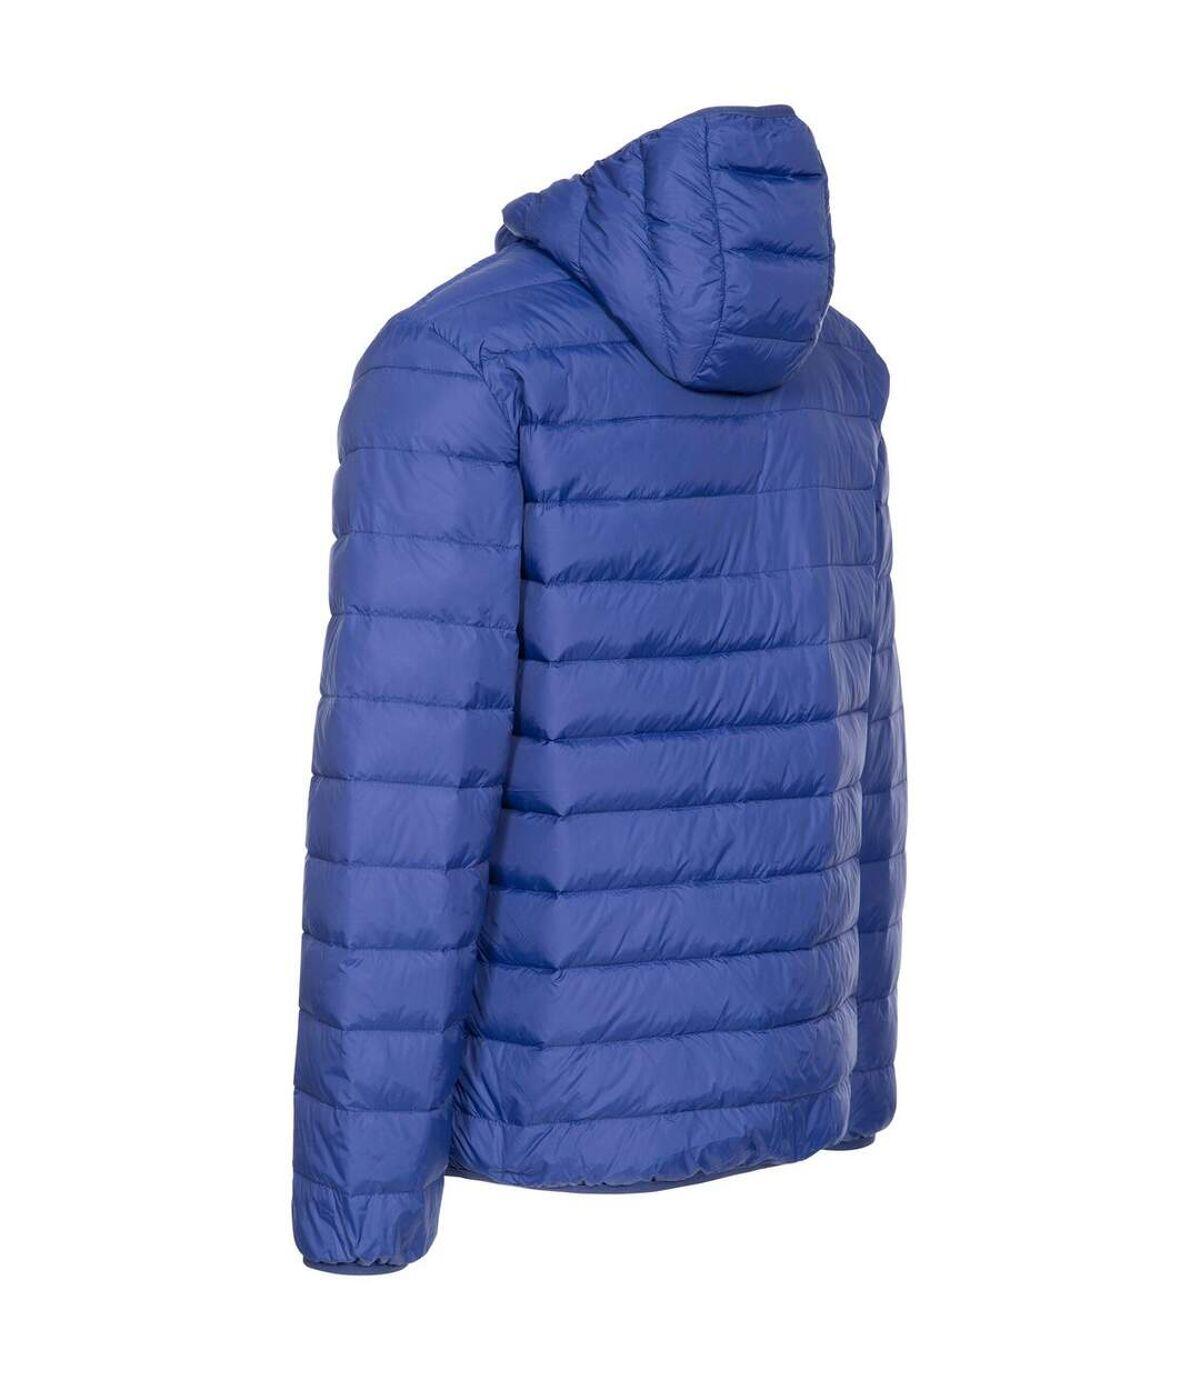 Trespass Mens Stanley Down Jacket (Blue) - UTTP5164